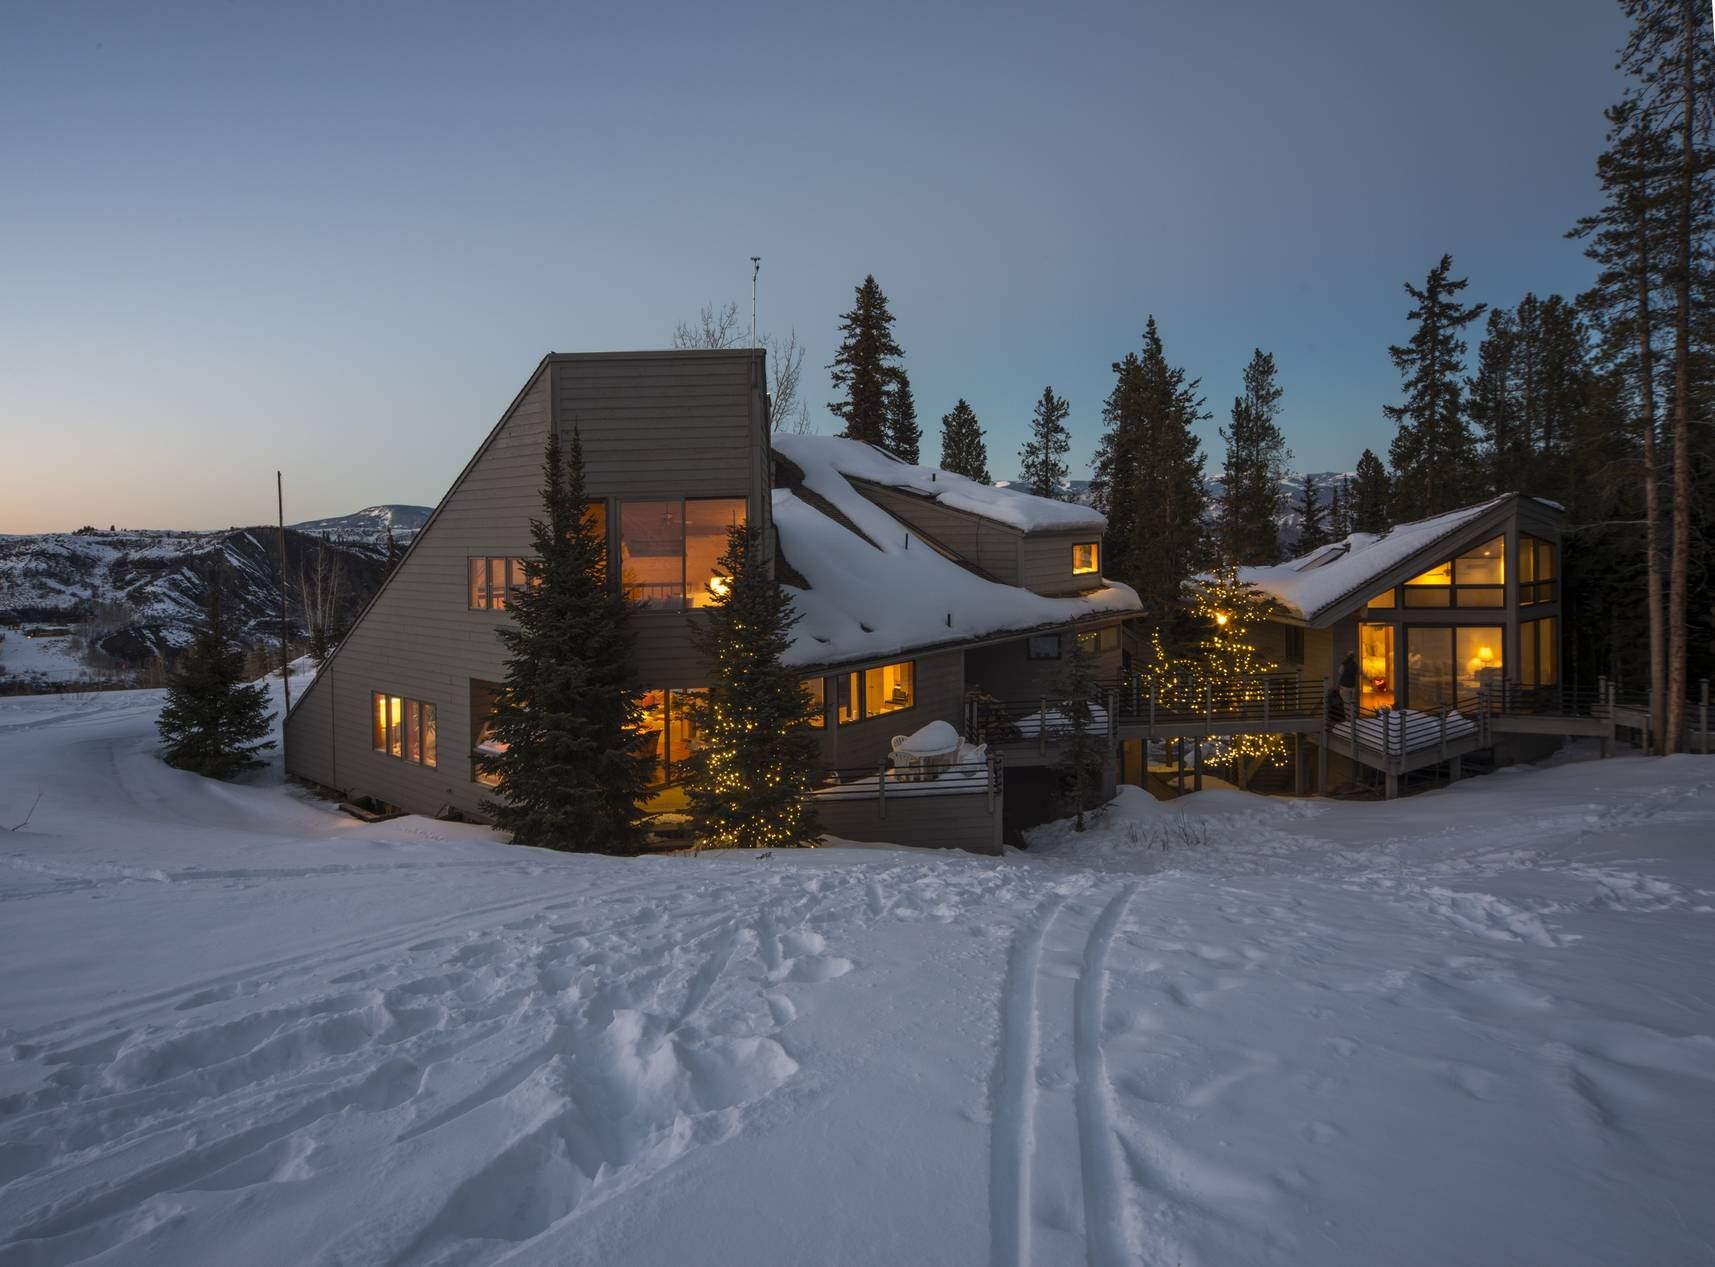 85 Pine Lane Snowmass Village Photo